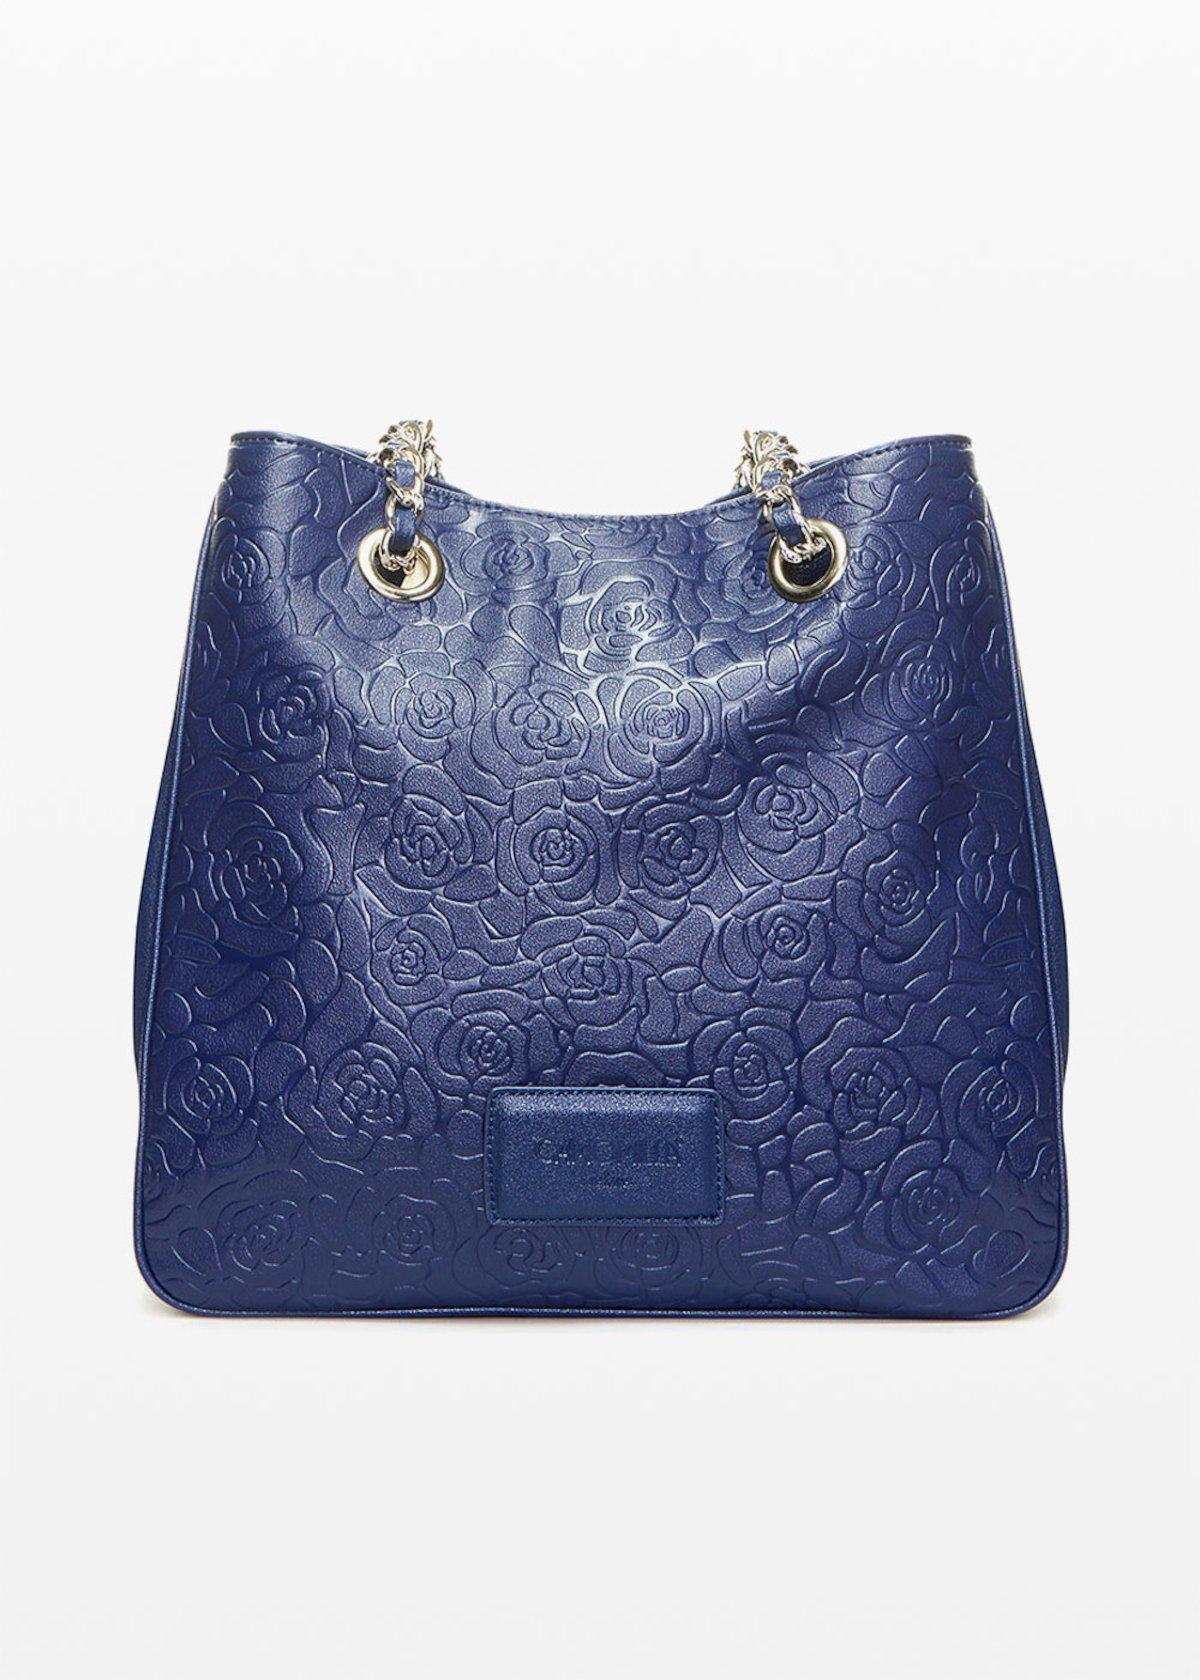 Shopping bag Brandy6 in ecopelle flower fantasy - Night - Donna - Immagine categoria